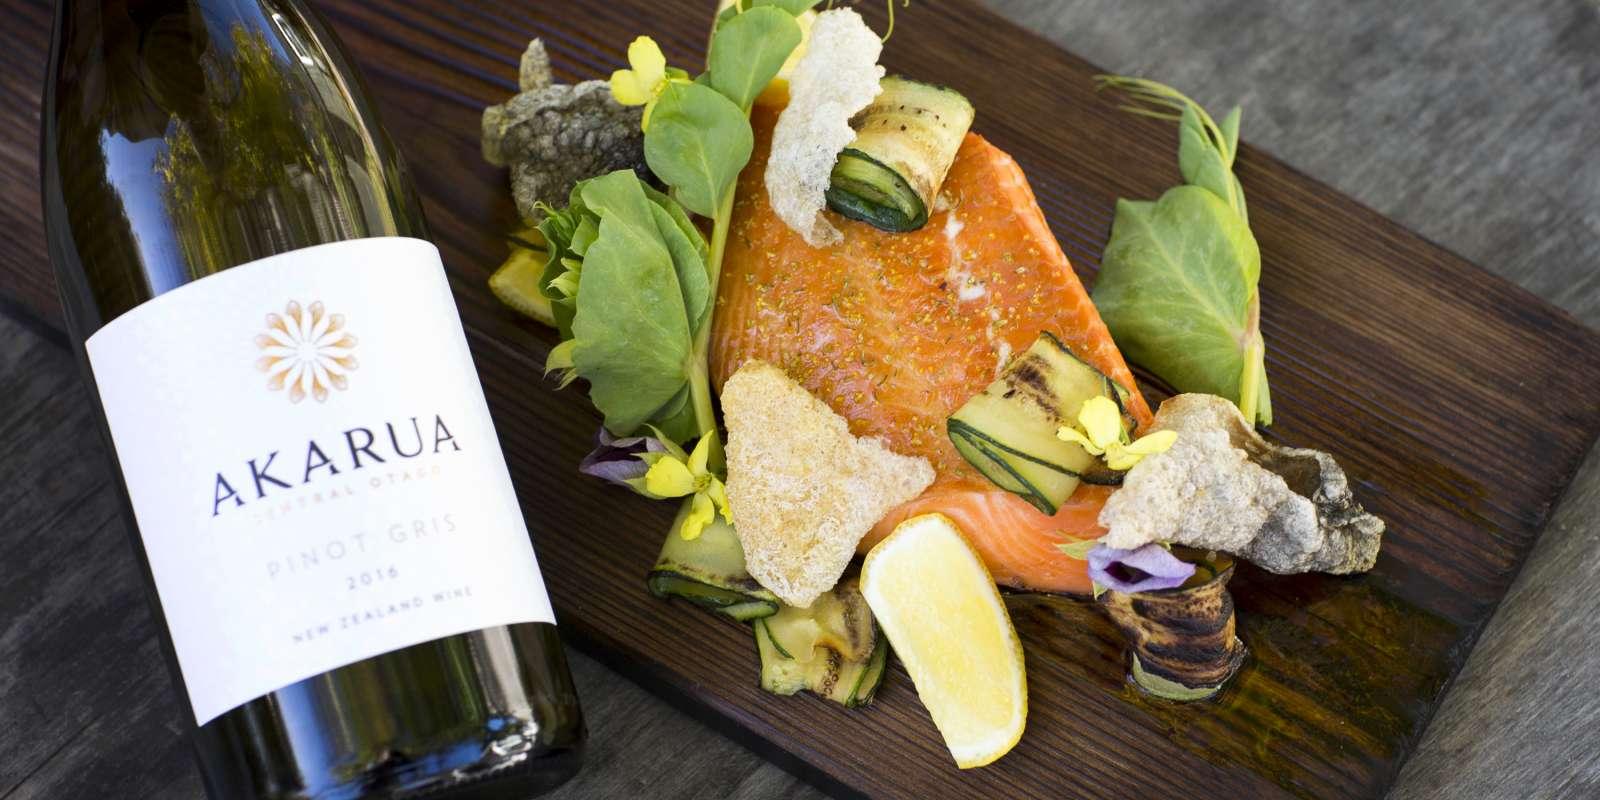 Autumn wine and food at Akarua Winery & Kitchen